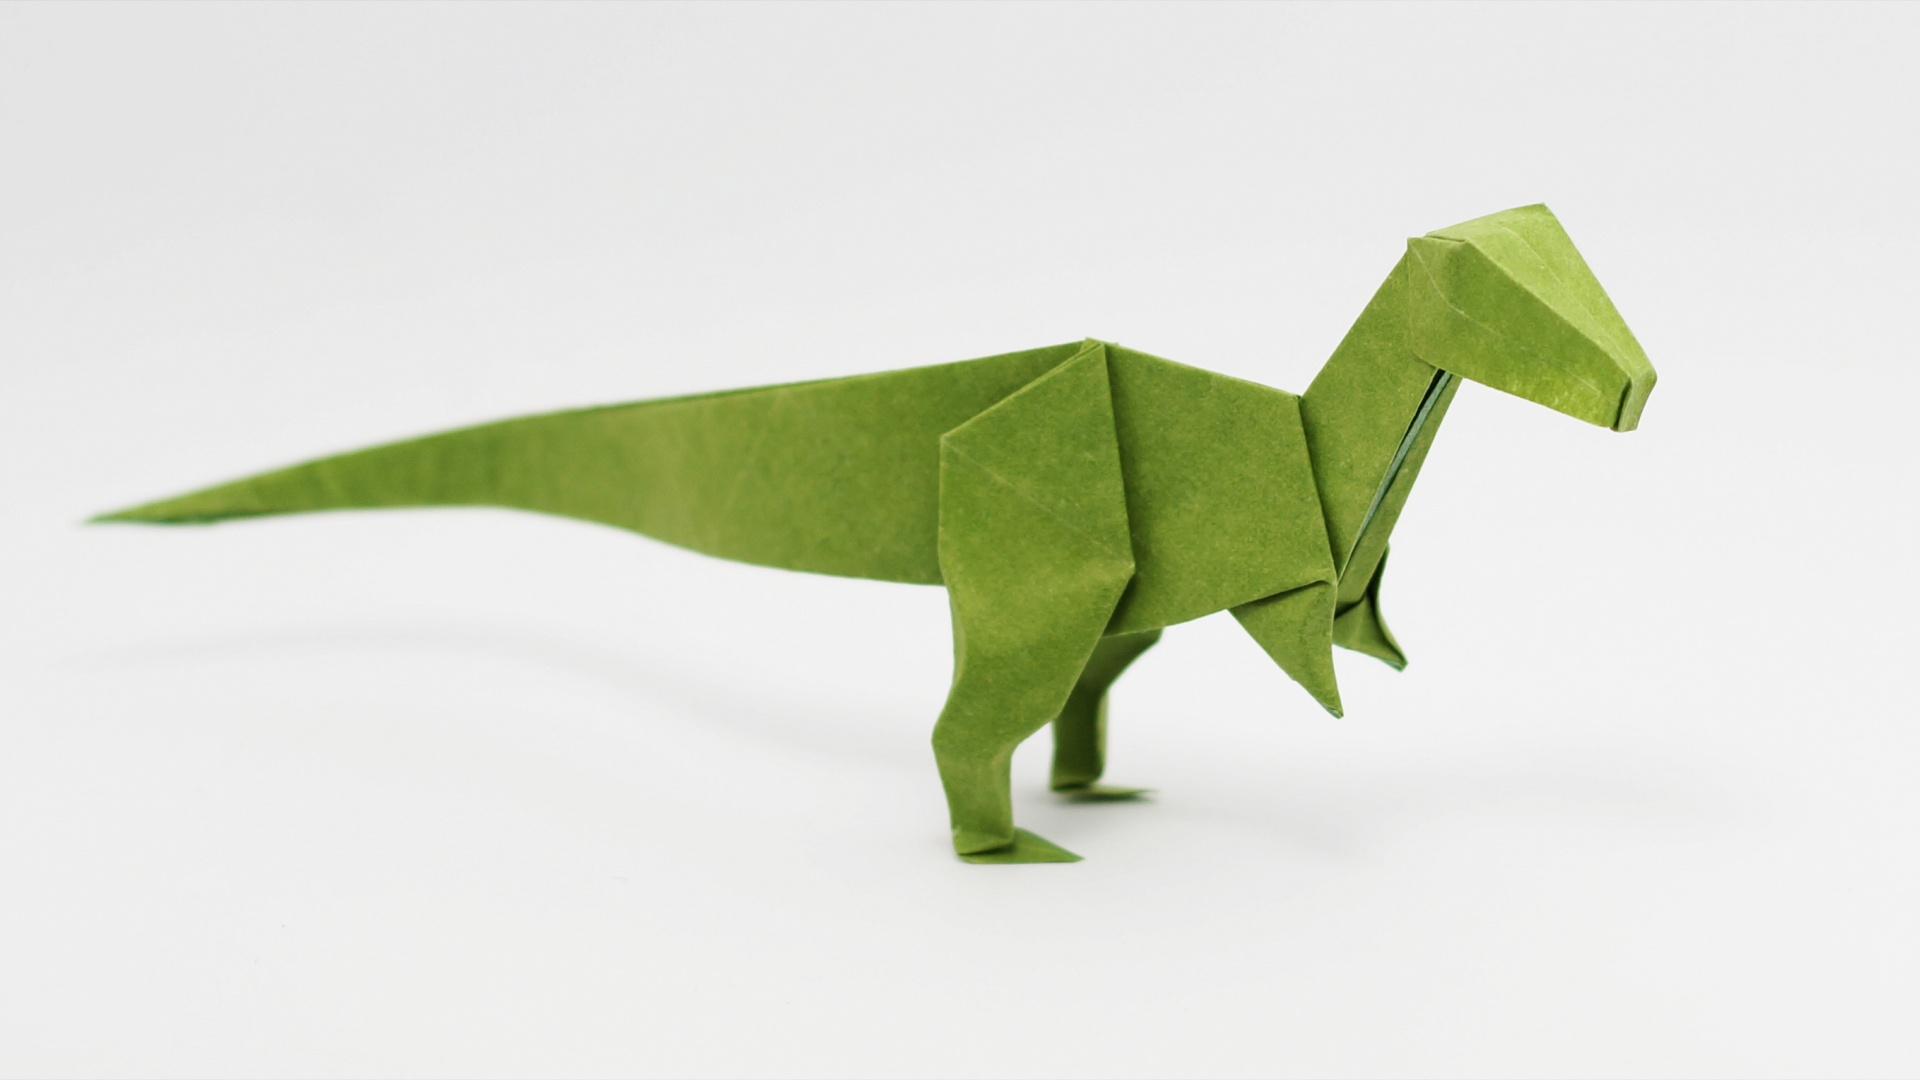 Origami Dinosaur Diagrams Great Installation Of Wiring Diagram Complex Dragon Instructions How To Make Velociraptor And Video Jo Nakashima Rh Jonakashima Com Br